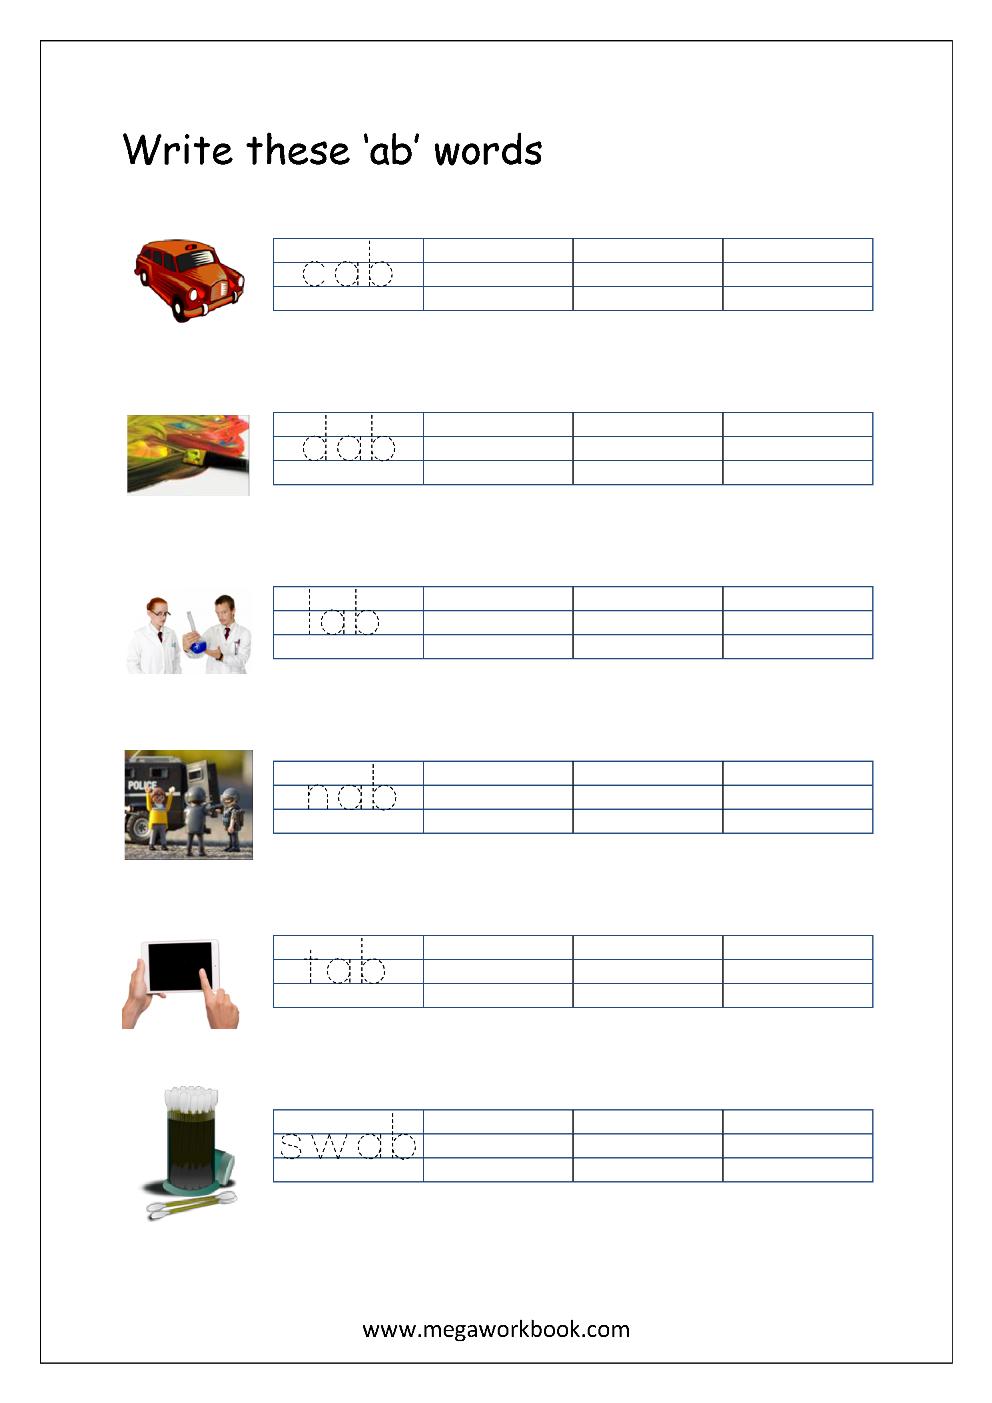 Free Printable Cvc Words Writing Worksheets For Kids - Three